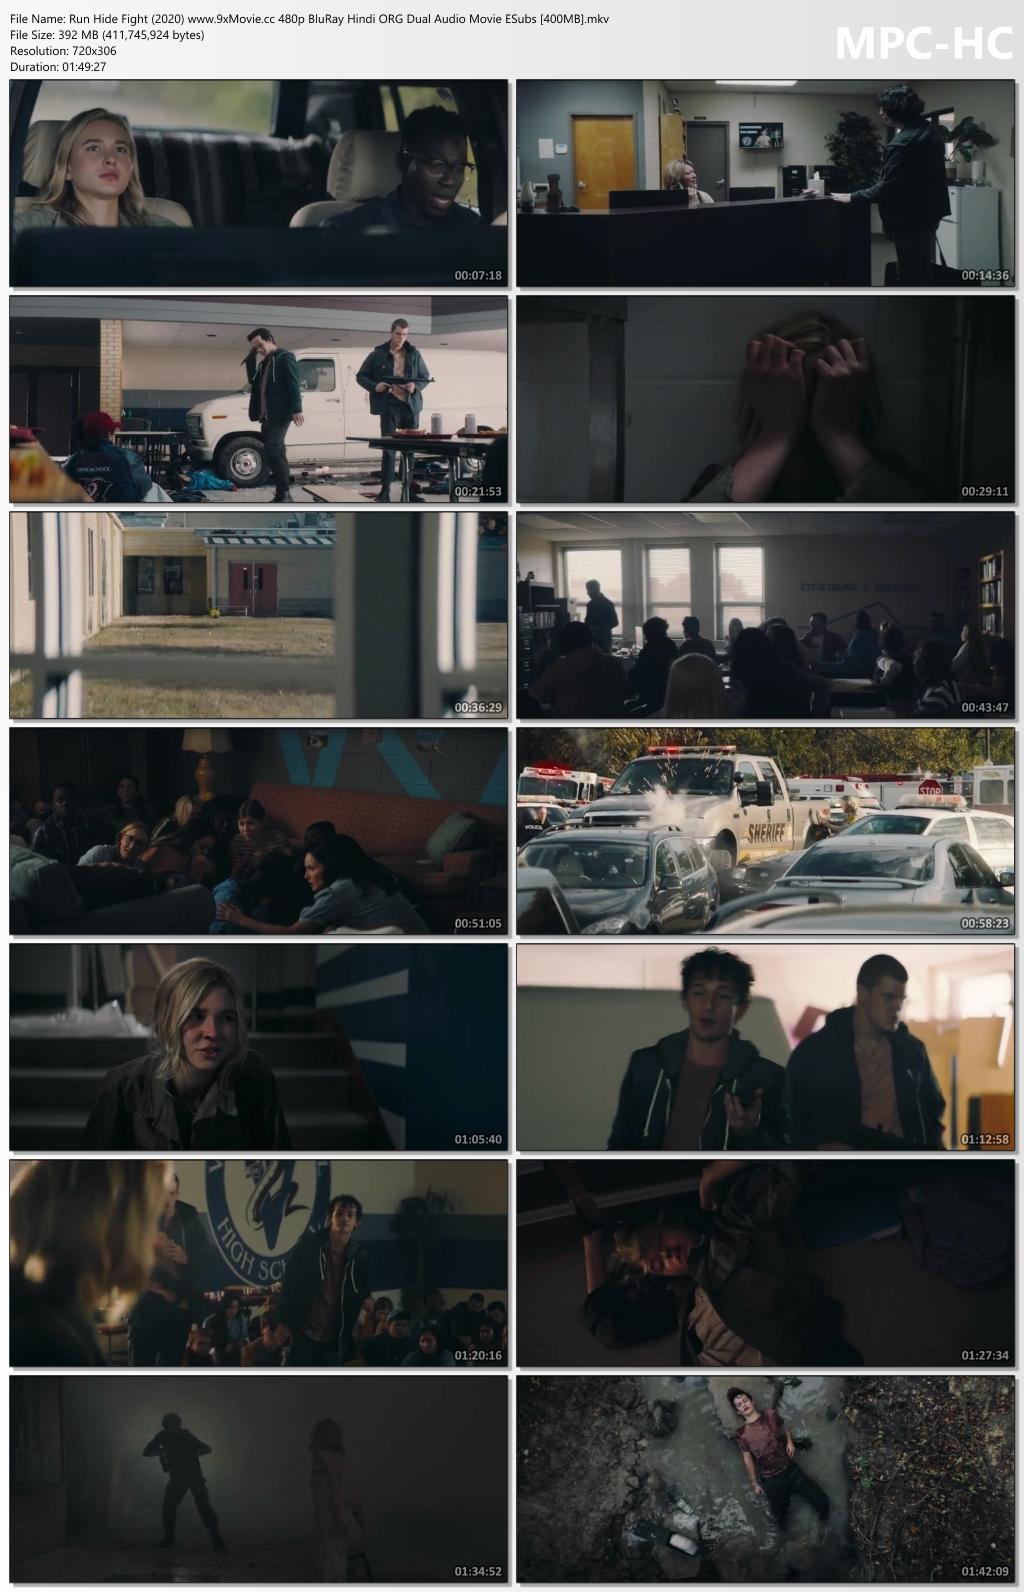 Run-Hide-Fight-2020-www-9x-Movie-cc-480p-Blu-Ray-Hindi-ORG-Dual-Audio-Movie-ESubs-400-MB-mkv